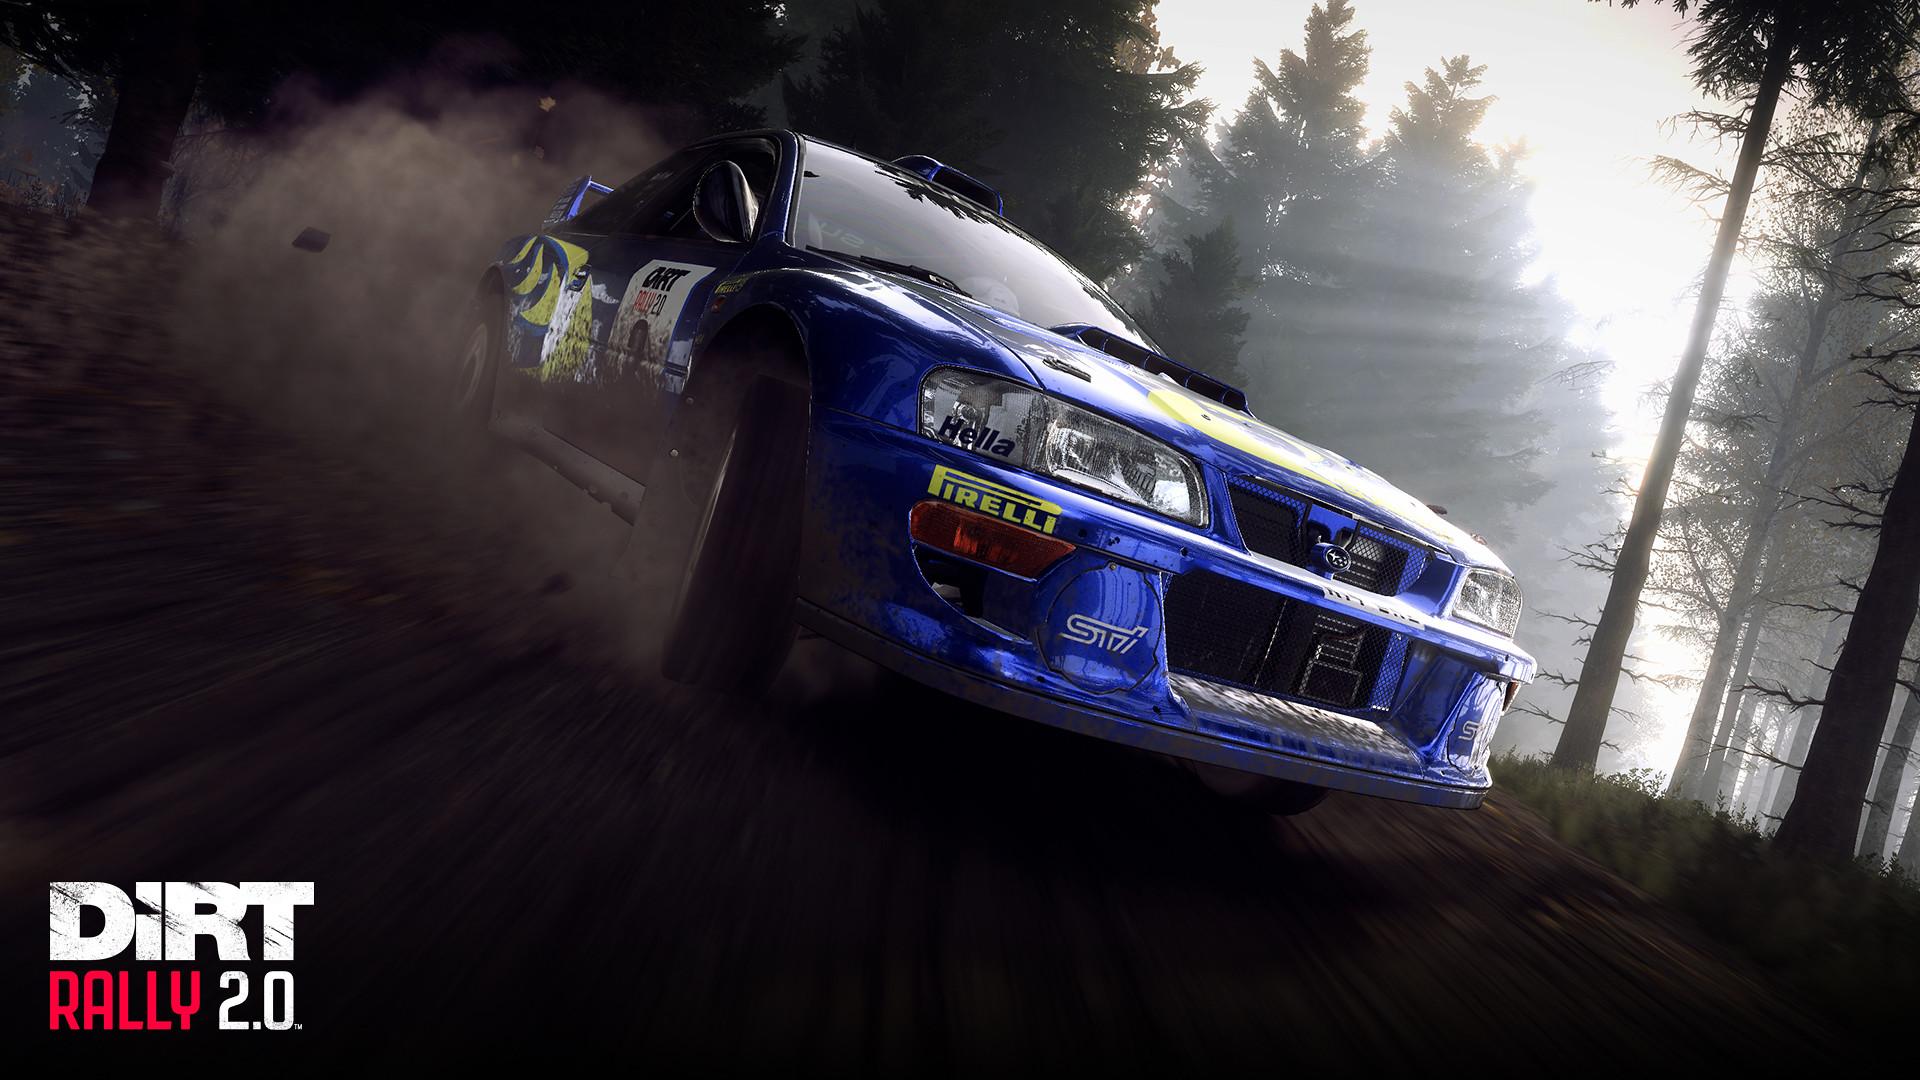 DiRT Rally 2.0 - Colin McRae 3